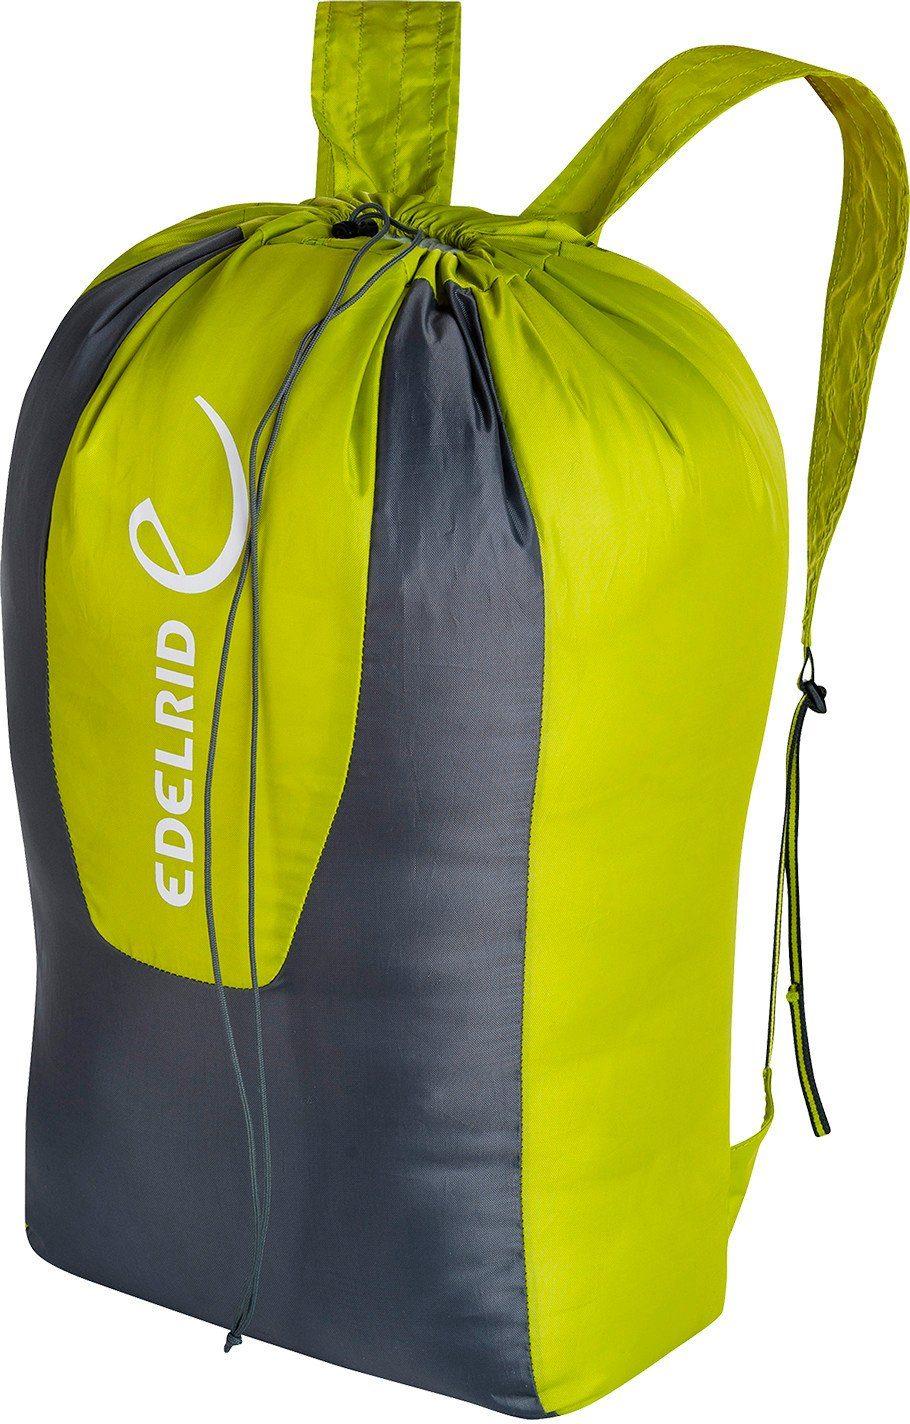 Edelrid Kletterrucksack »Lite Bag 30«